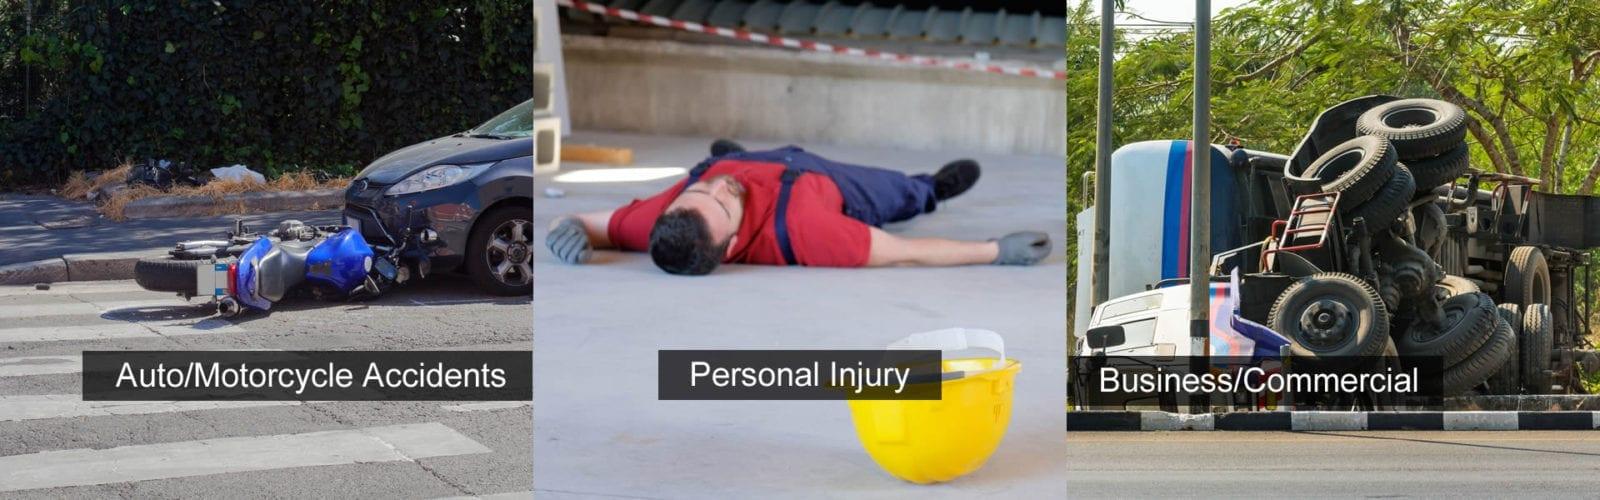 Accident Investigation | Keck Investigation Service, LLC